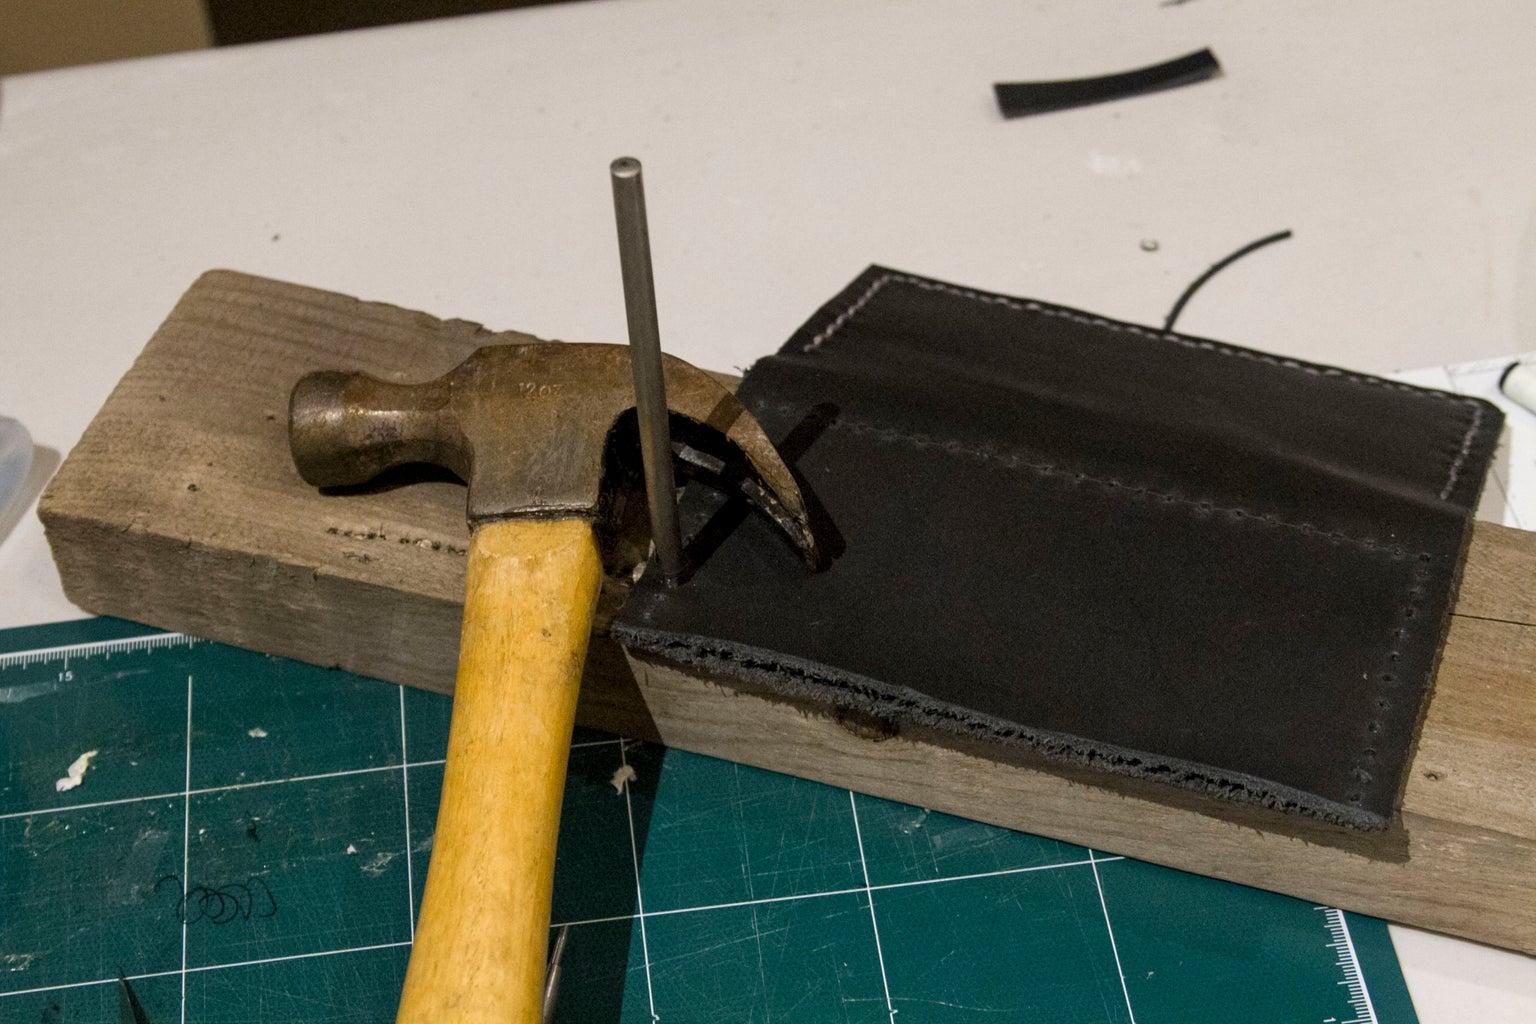 Step 7: Make Stitch Holes